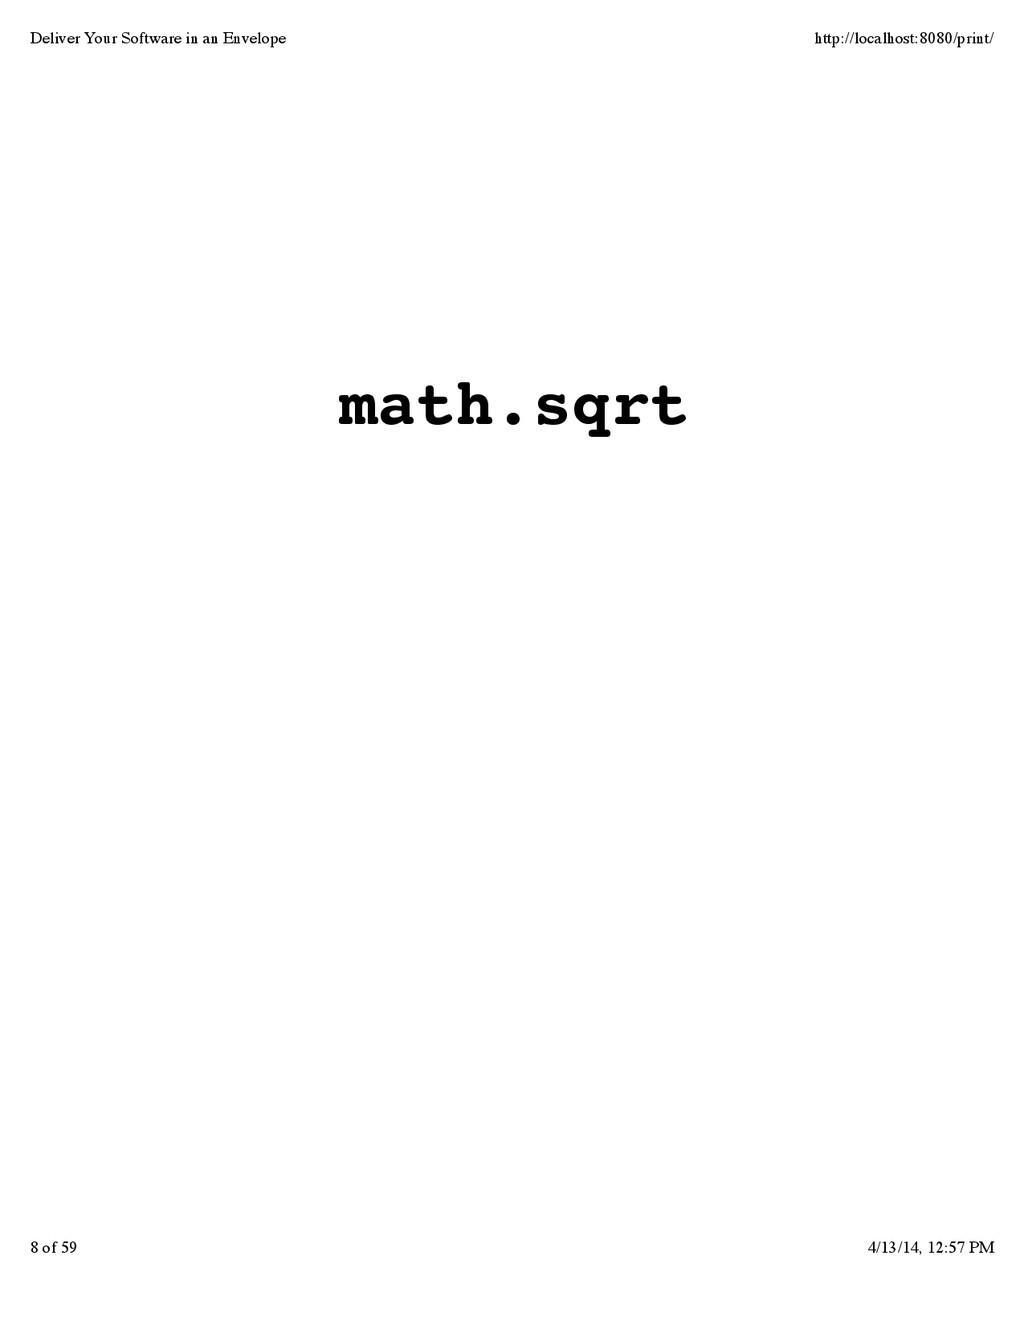 math.sqrt Deliver Your Software in an Envelope ...